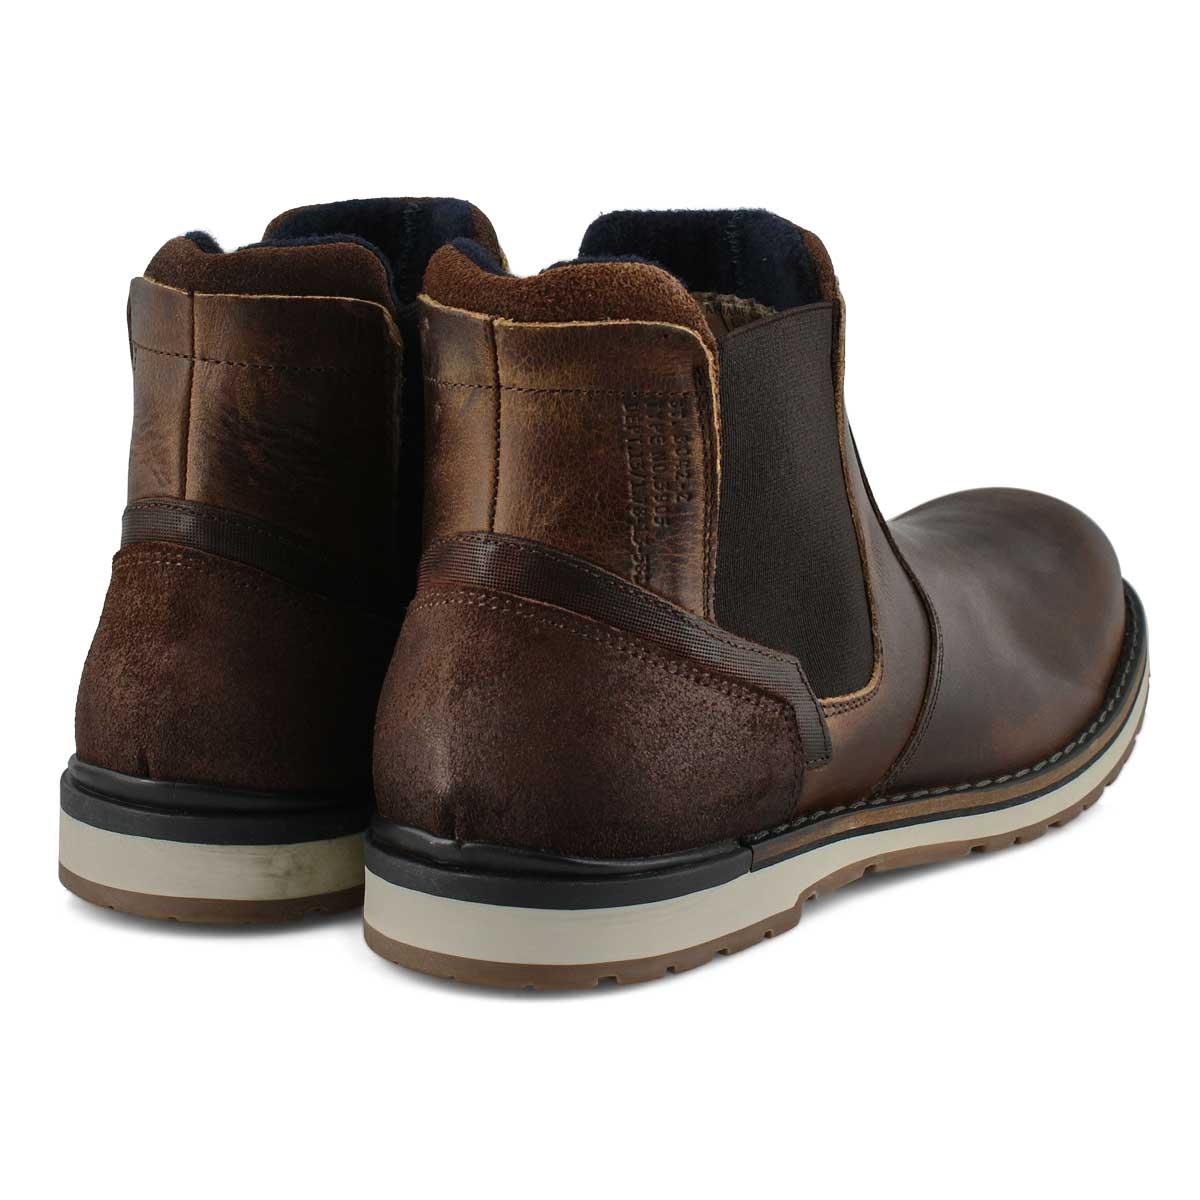 Men's Calvin Chelsea Boot - Black